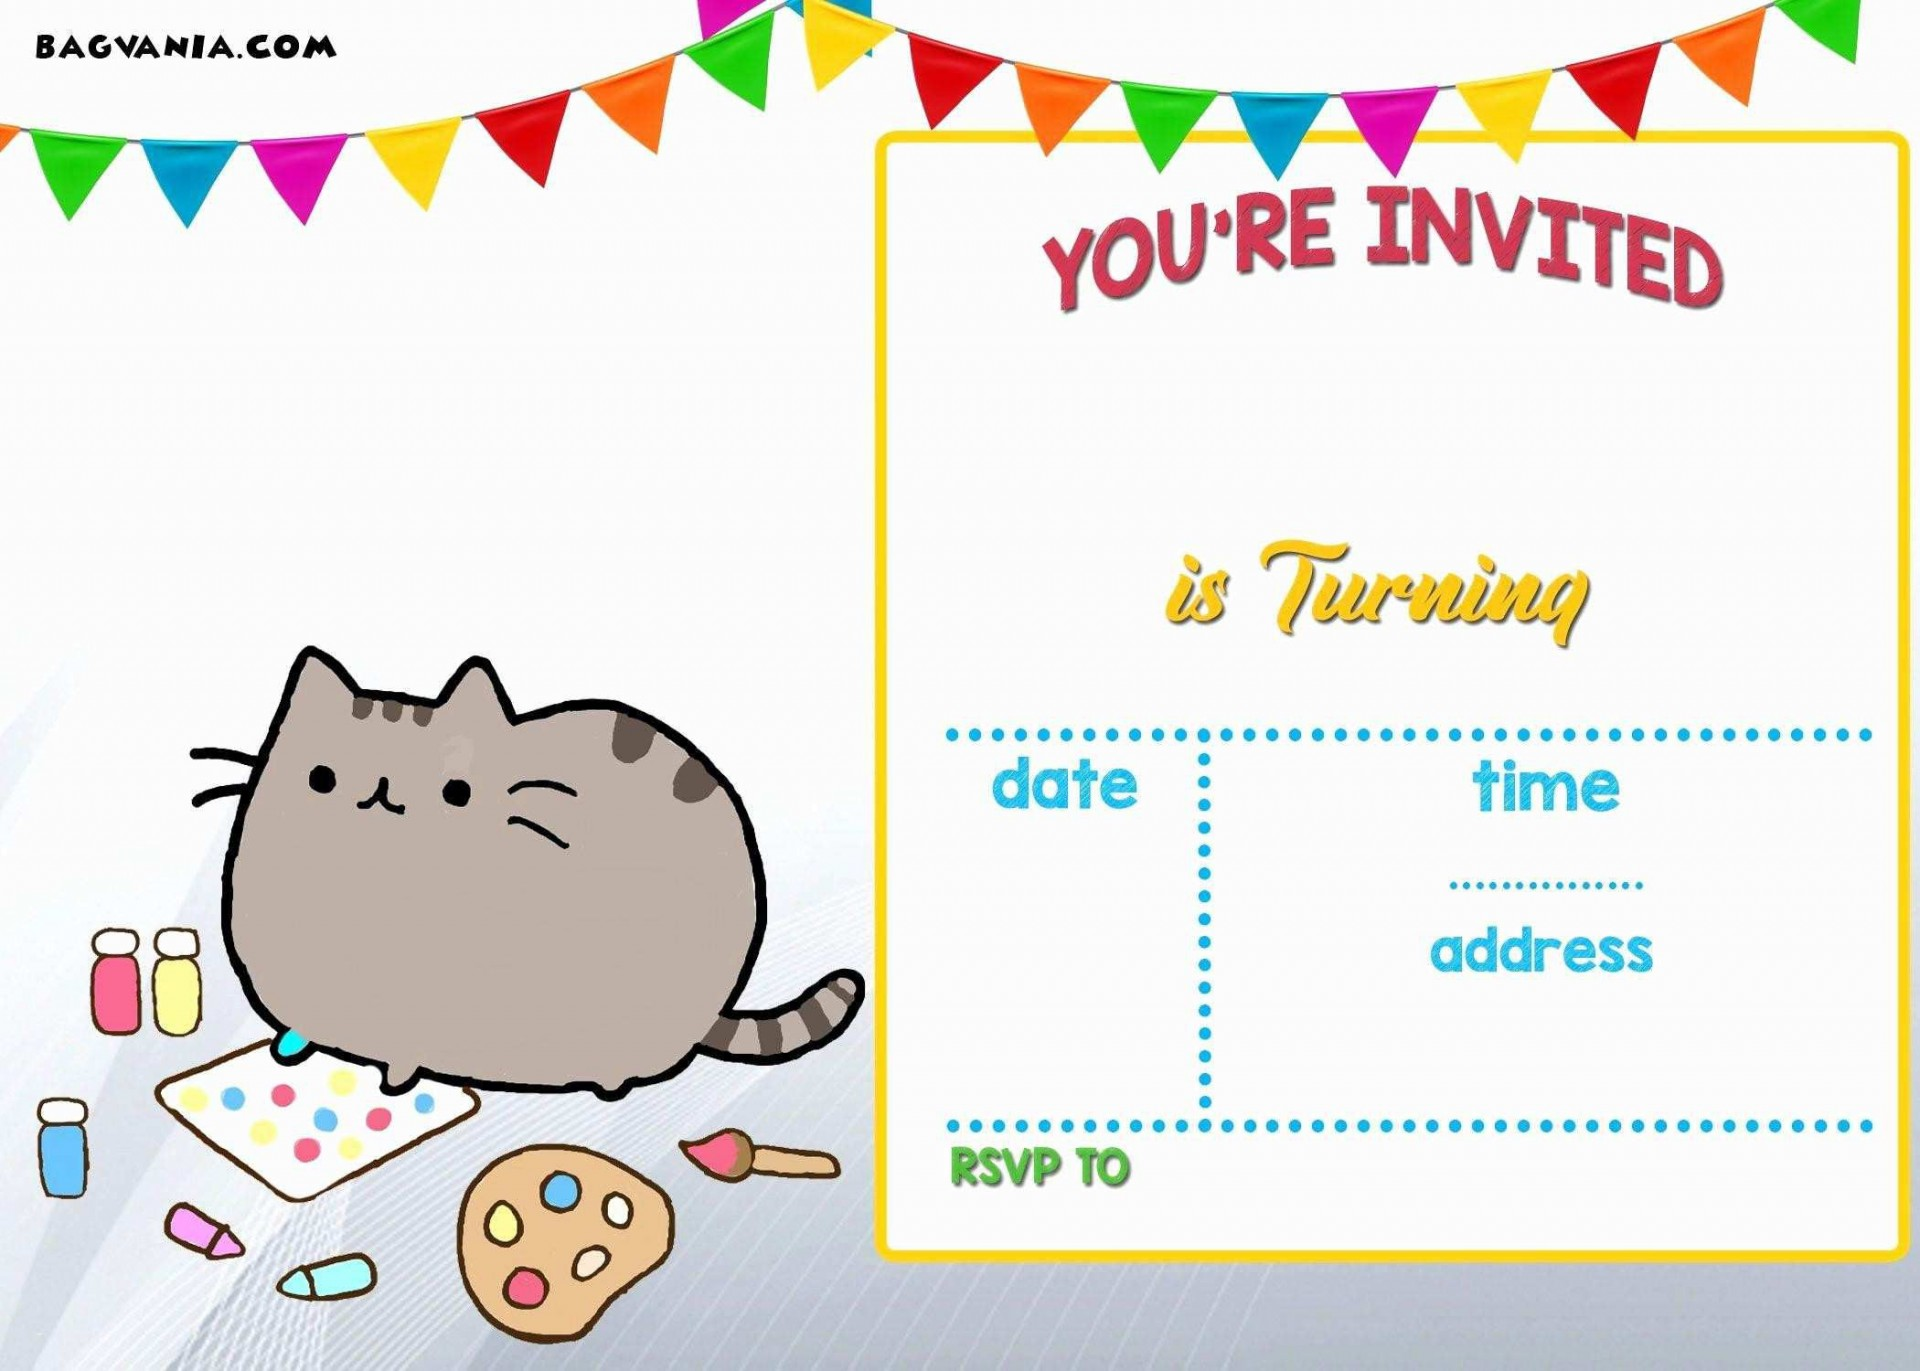 004 Shocking Invitation Template Free Printable Example  Editable Christma Party Dinner Retirement1920